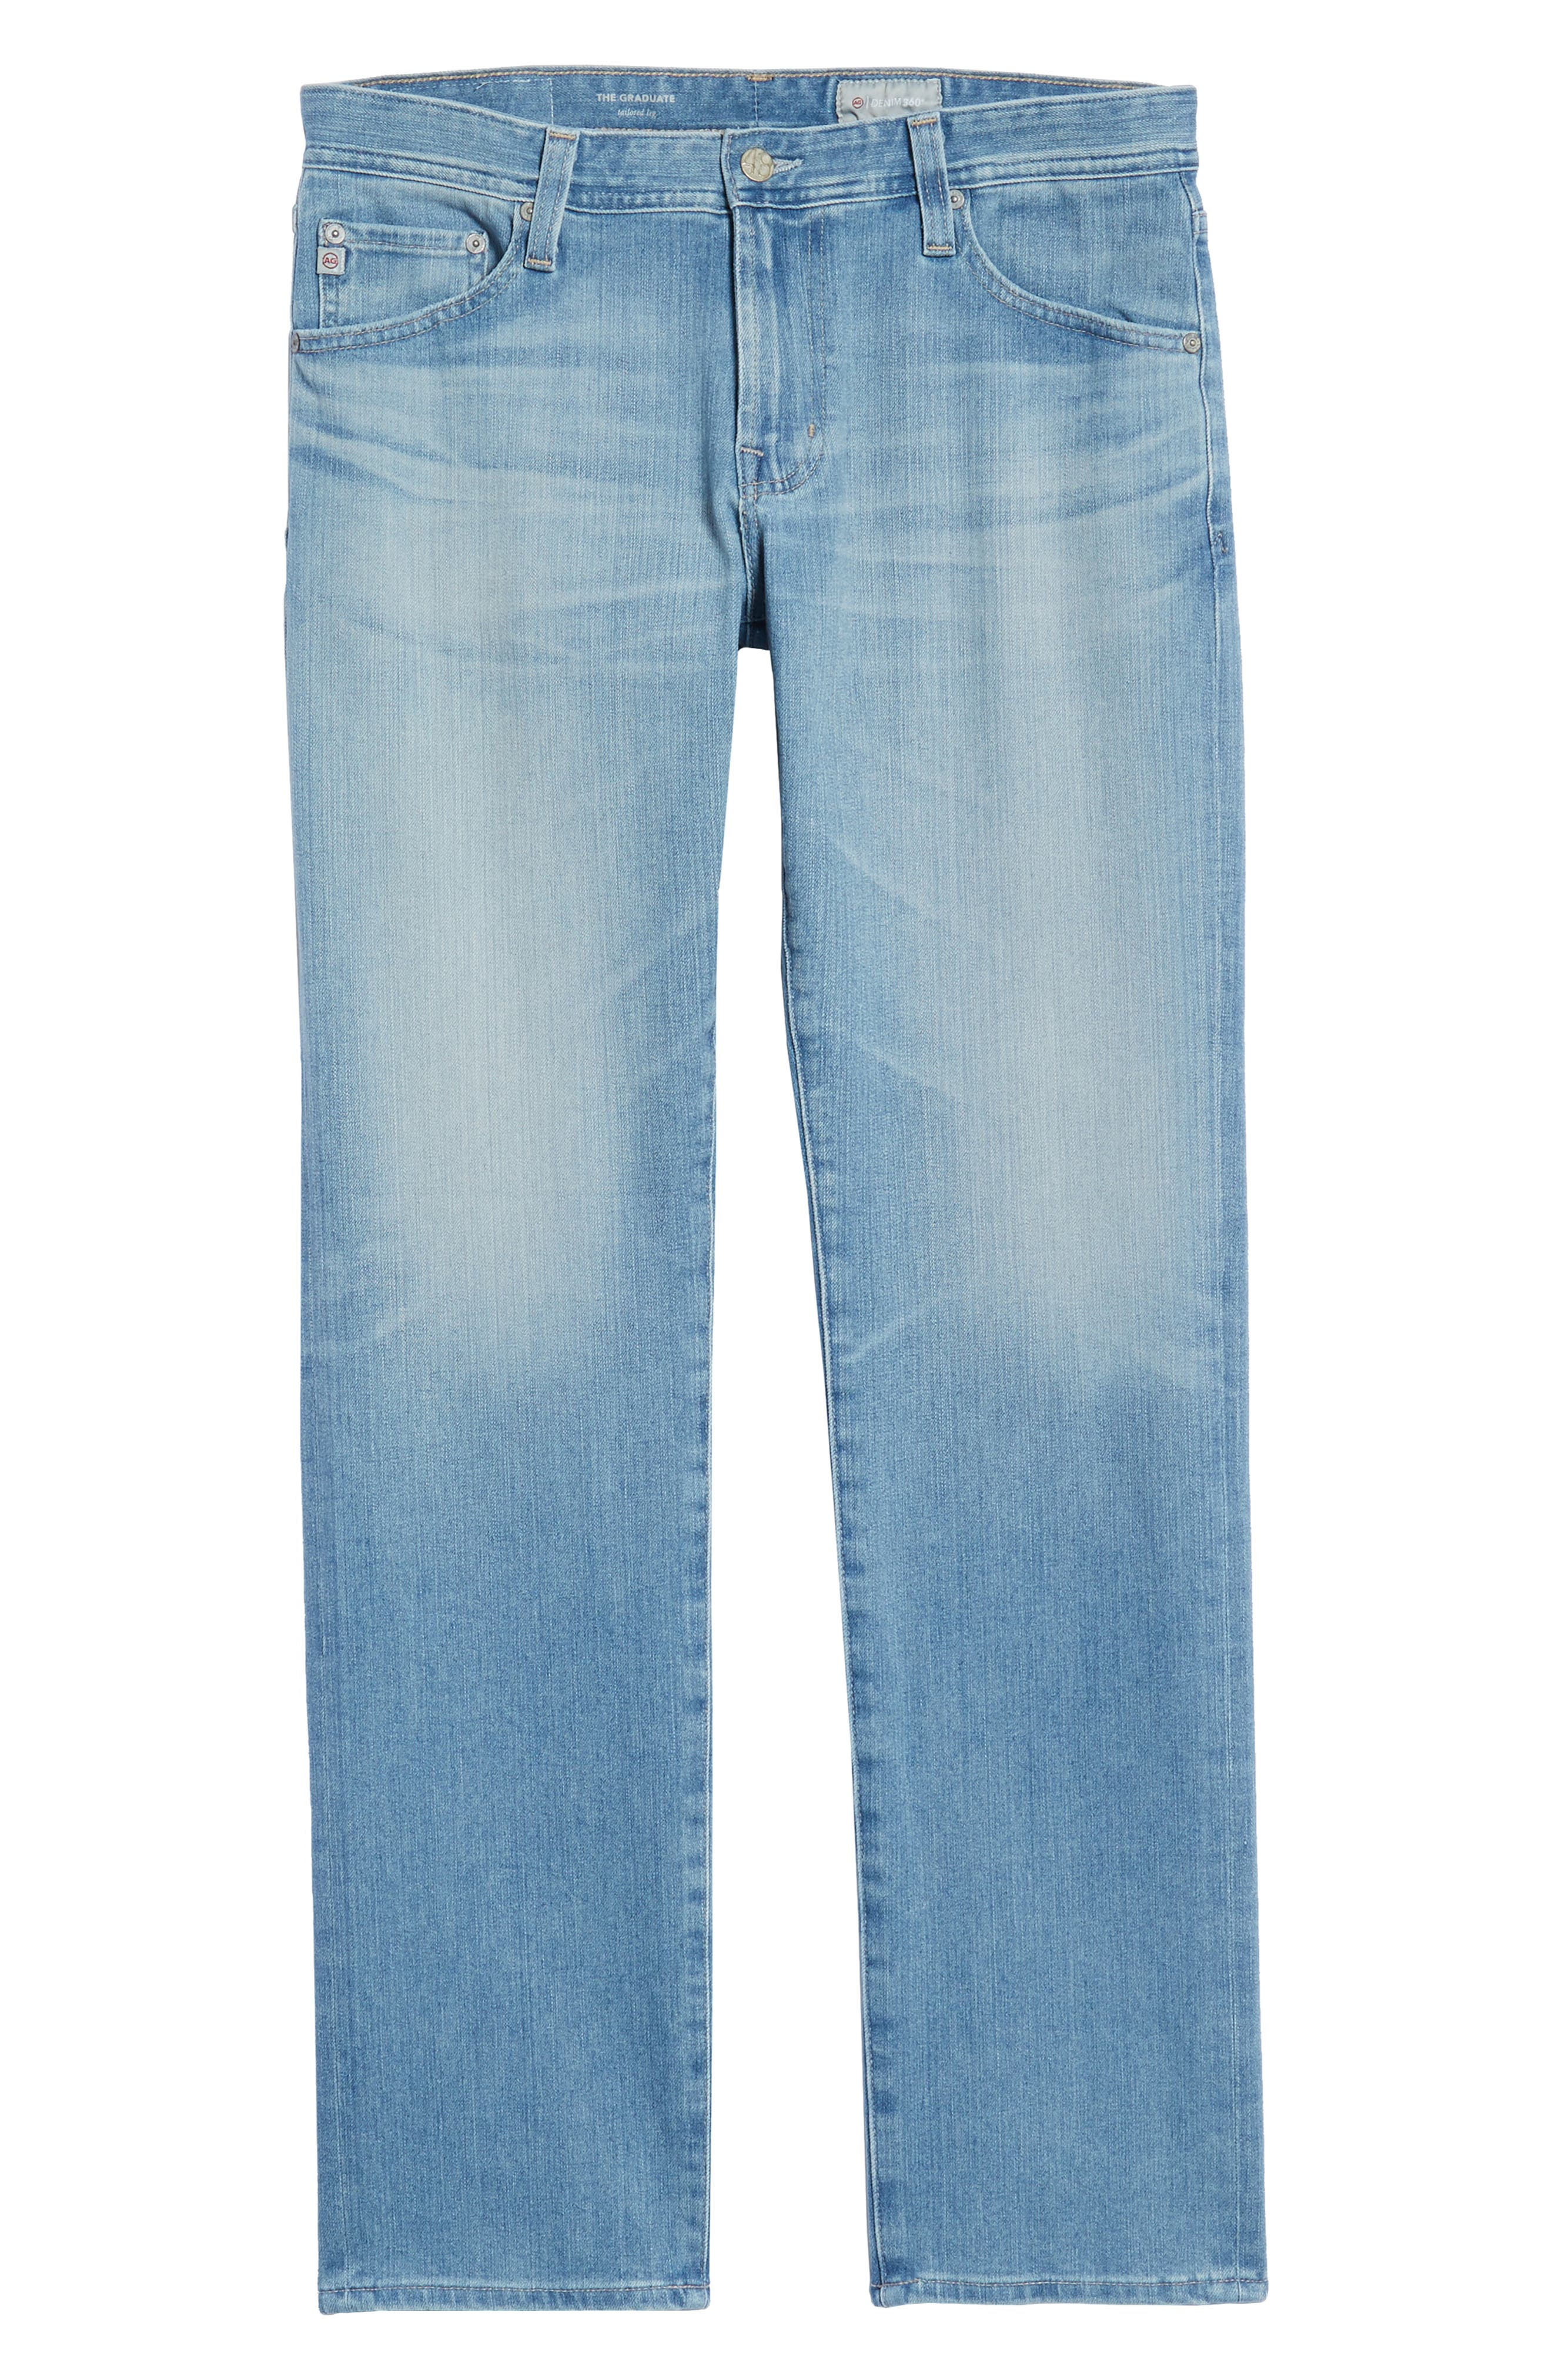 Graduate Slim Straight Leg Jeans,                             Alternate thumbnail 6, color,                             19 YEARS CHANNEL